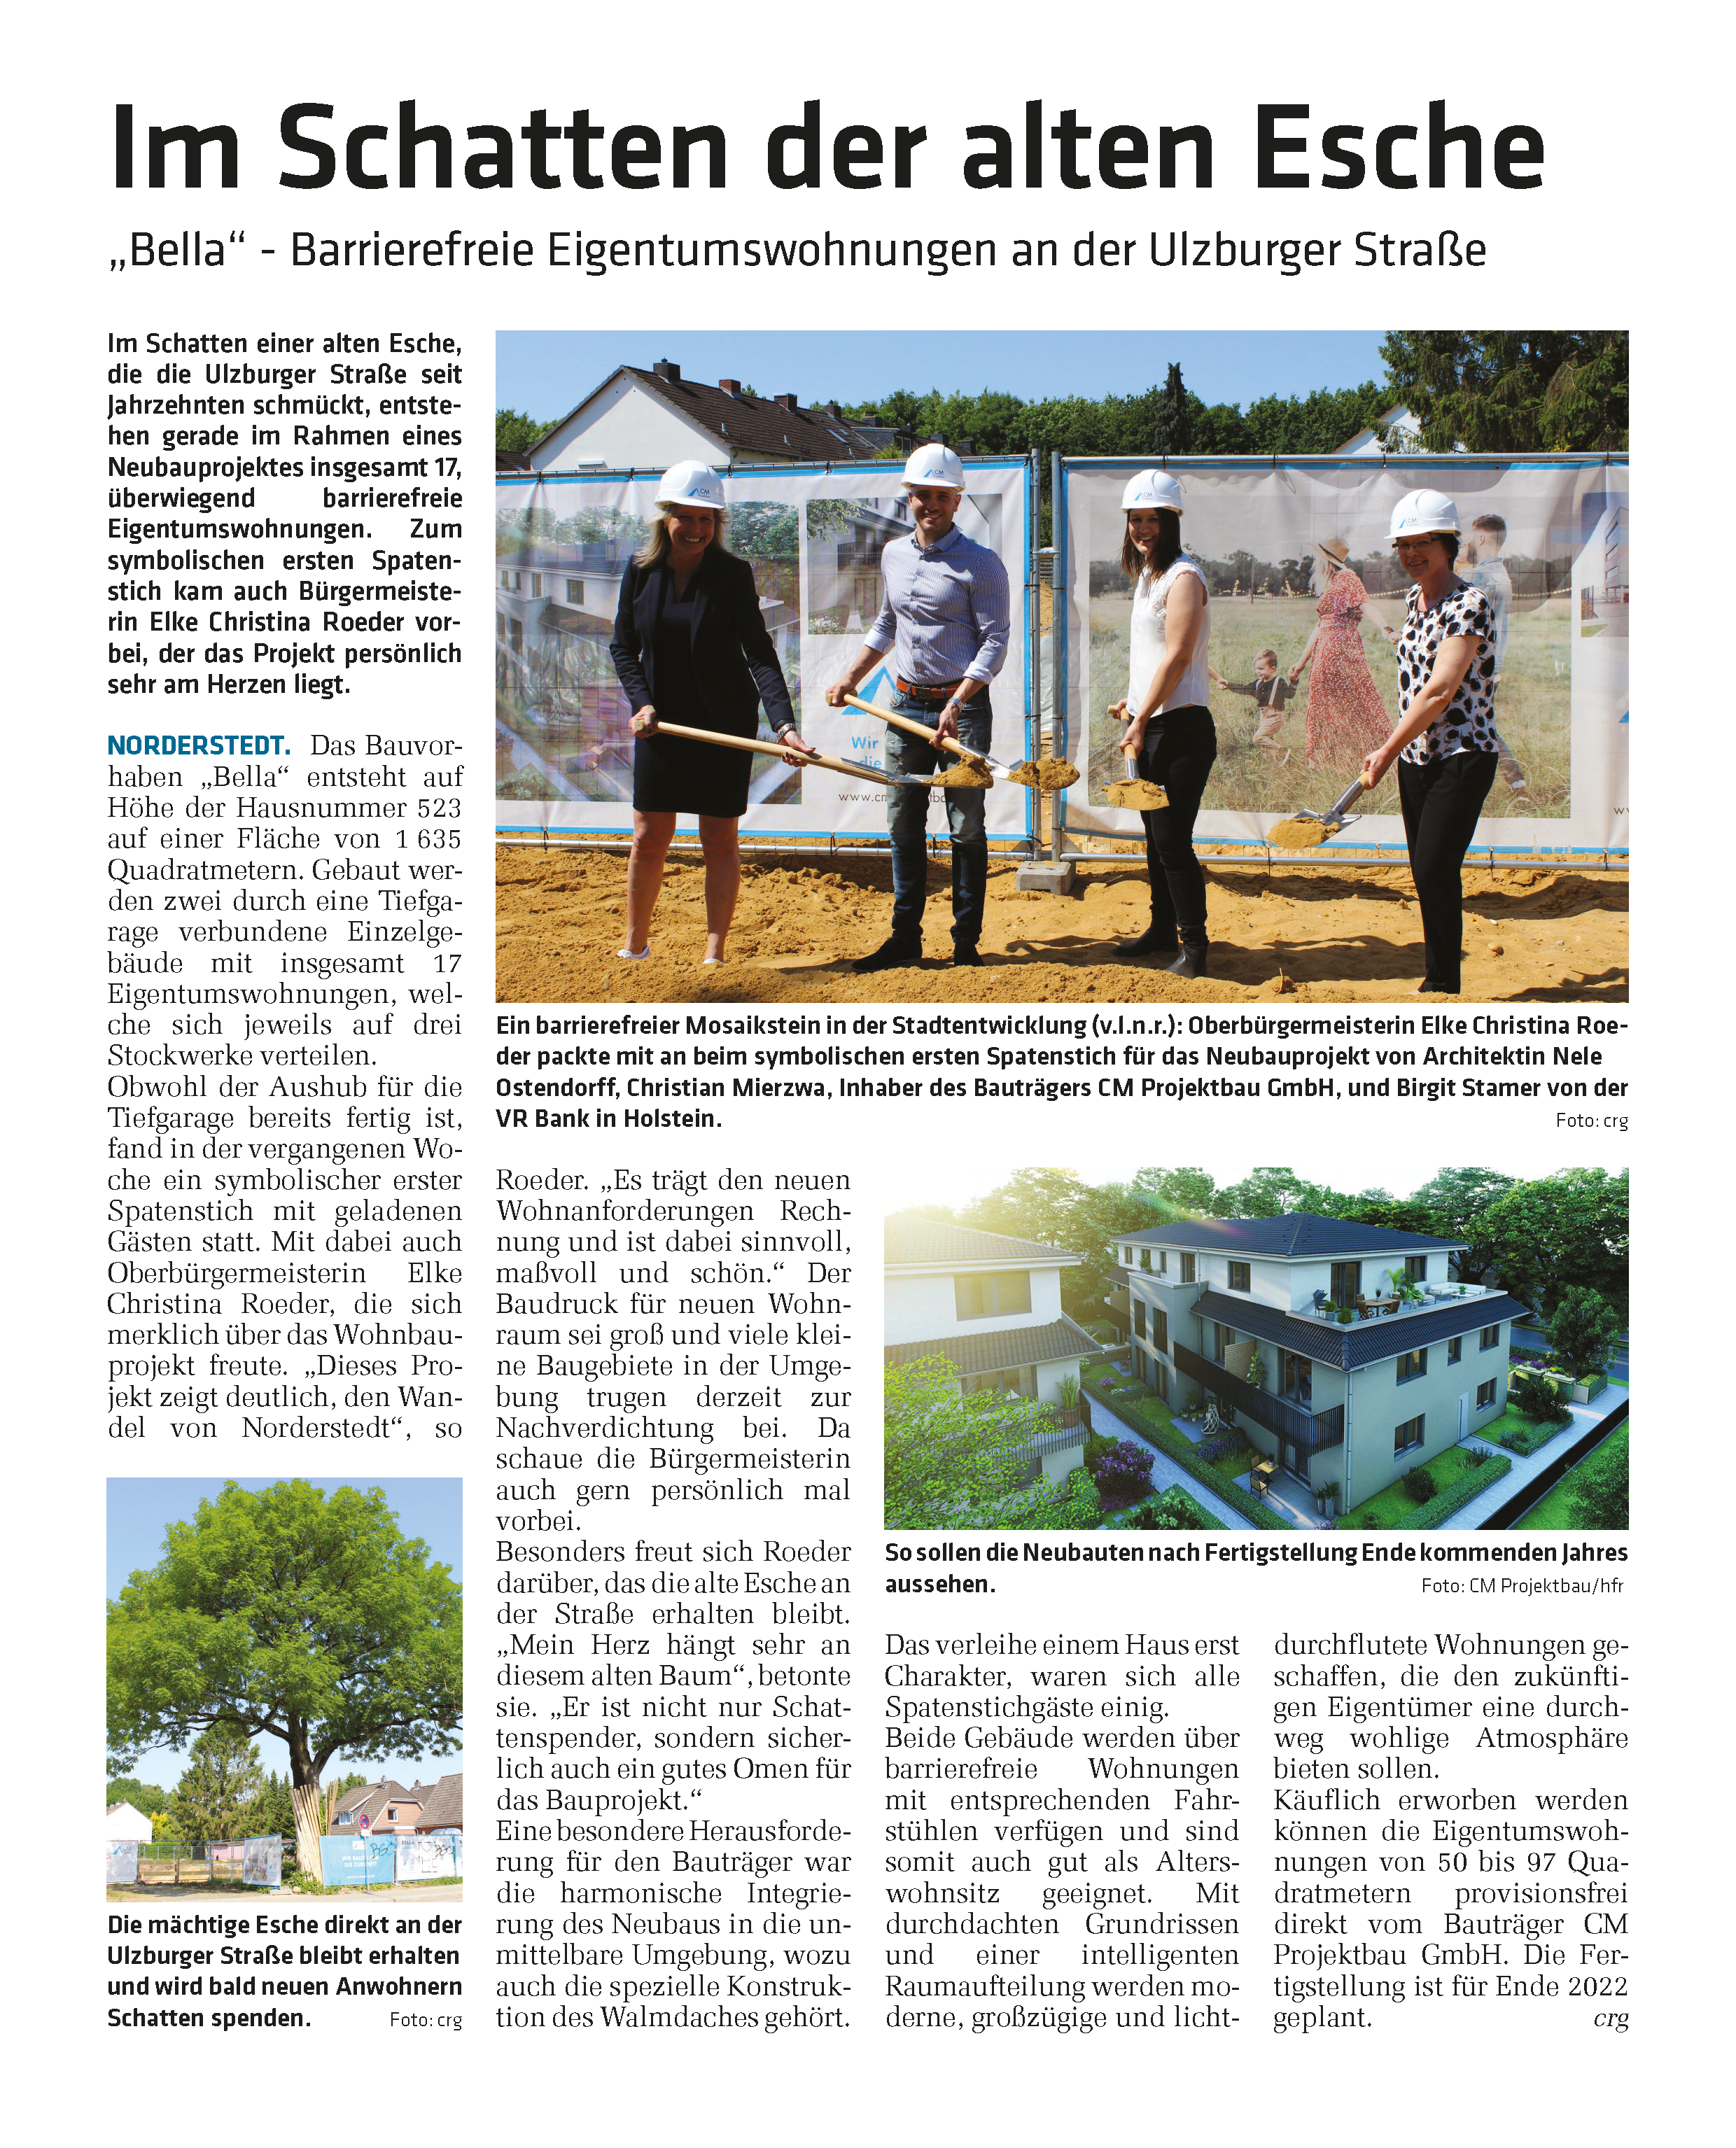 https://www.cm-projektbau.de/wp-content/uploads/2021/07/2021-06-23-Pressebericht-Heimatspiegel.png